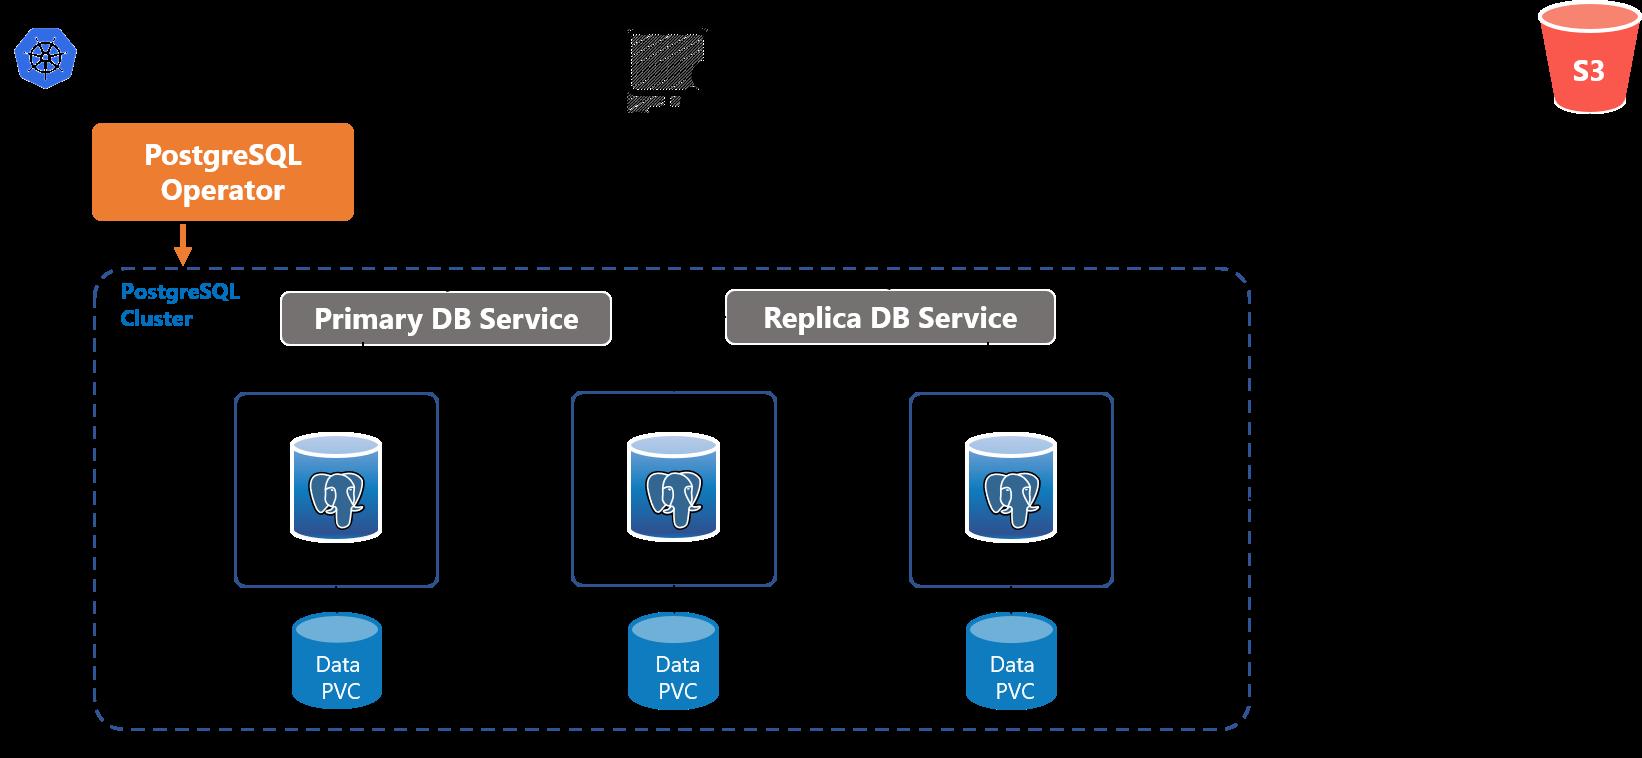 PostgreSQL Operatorの基本構成図